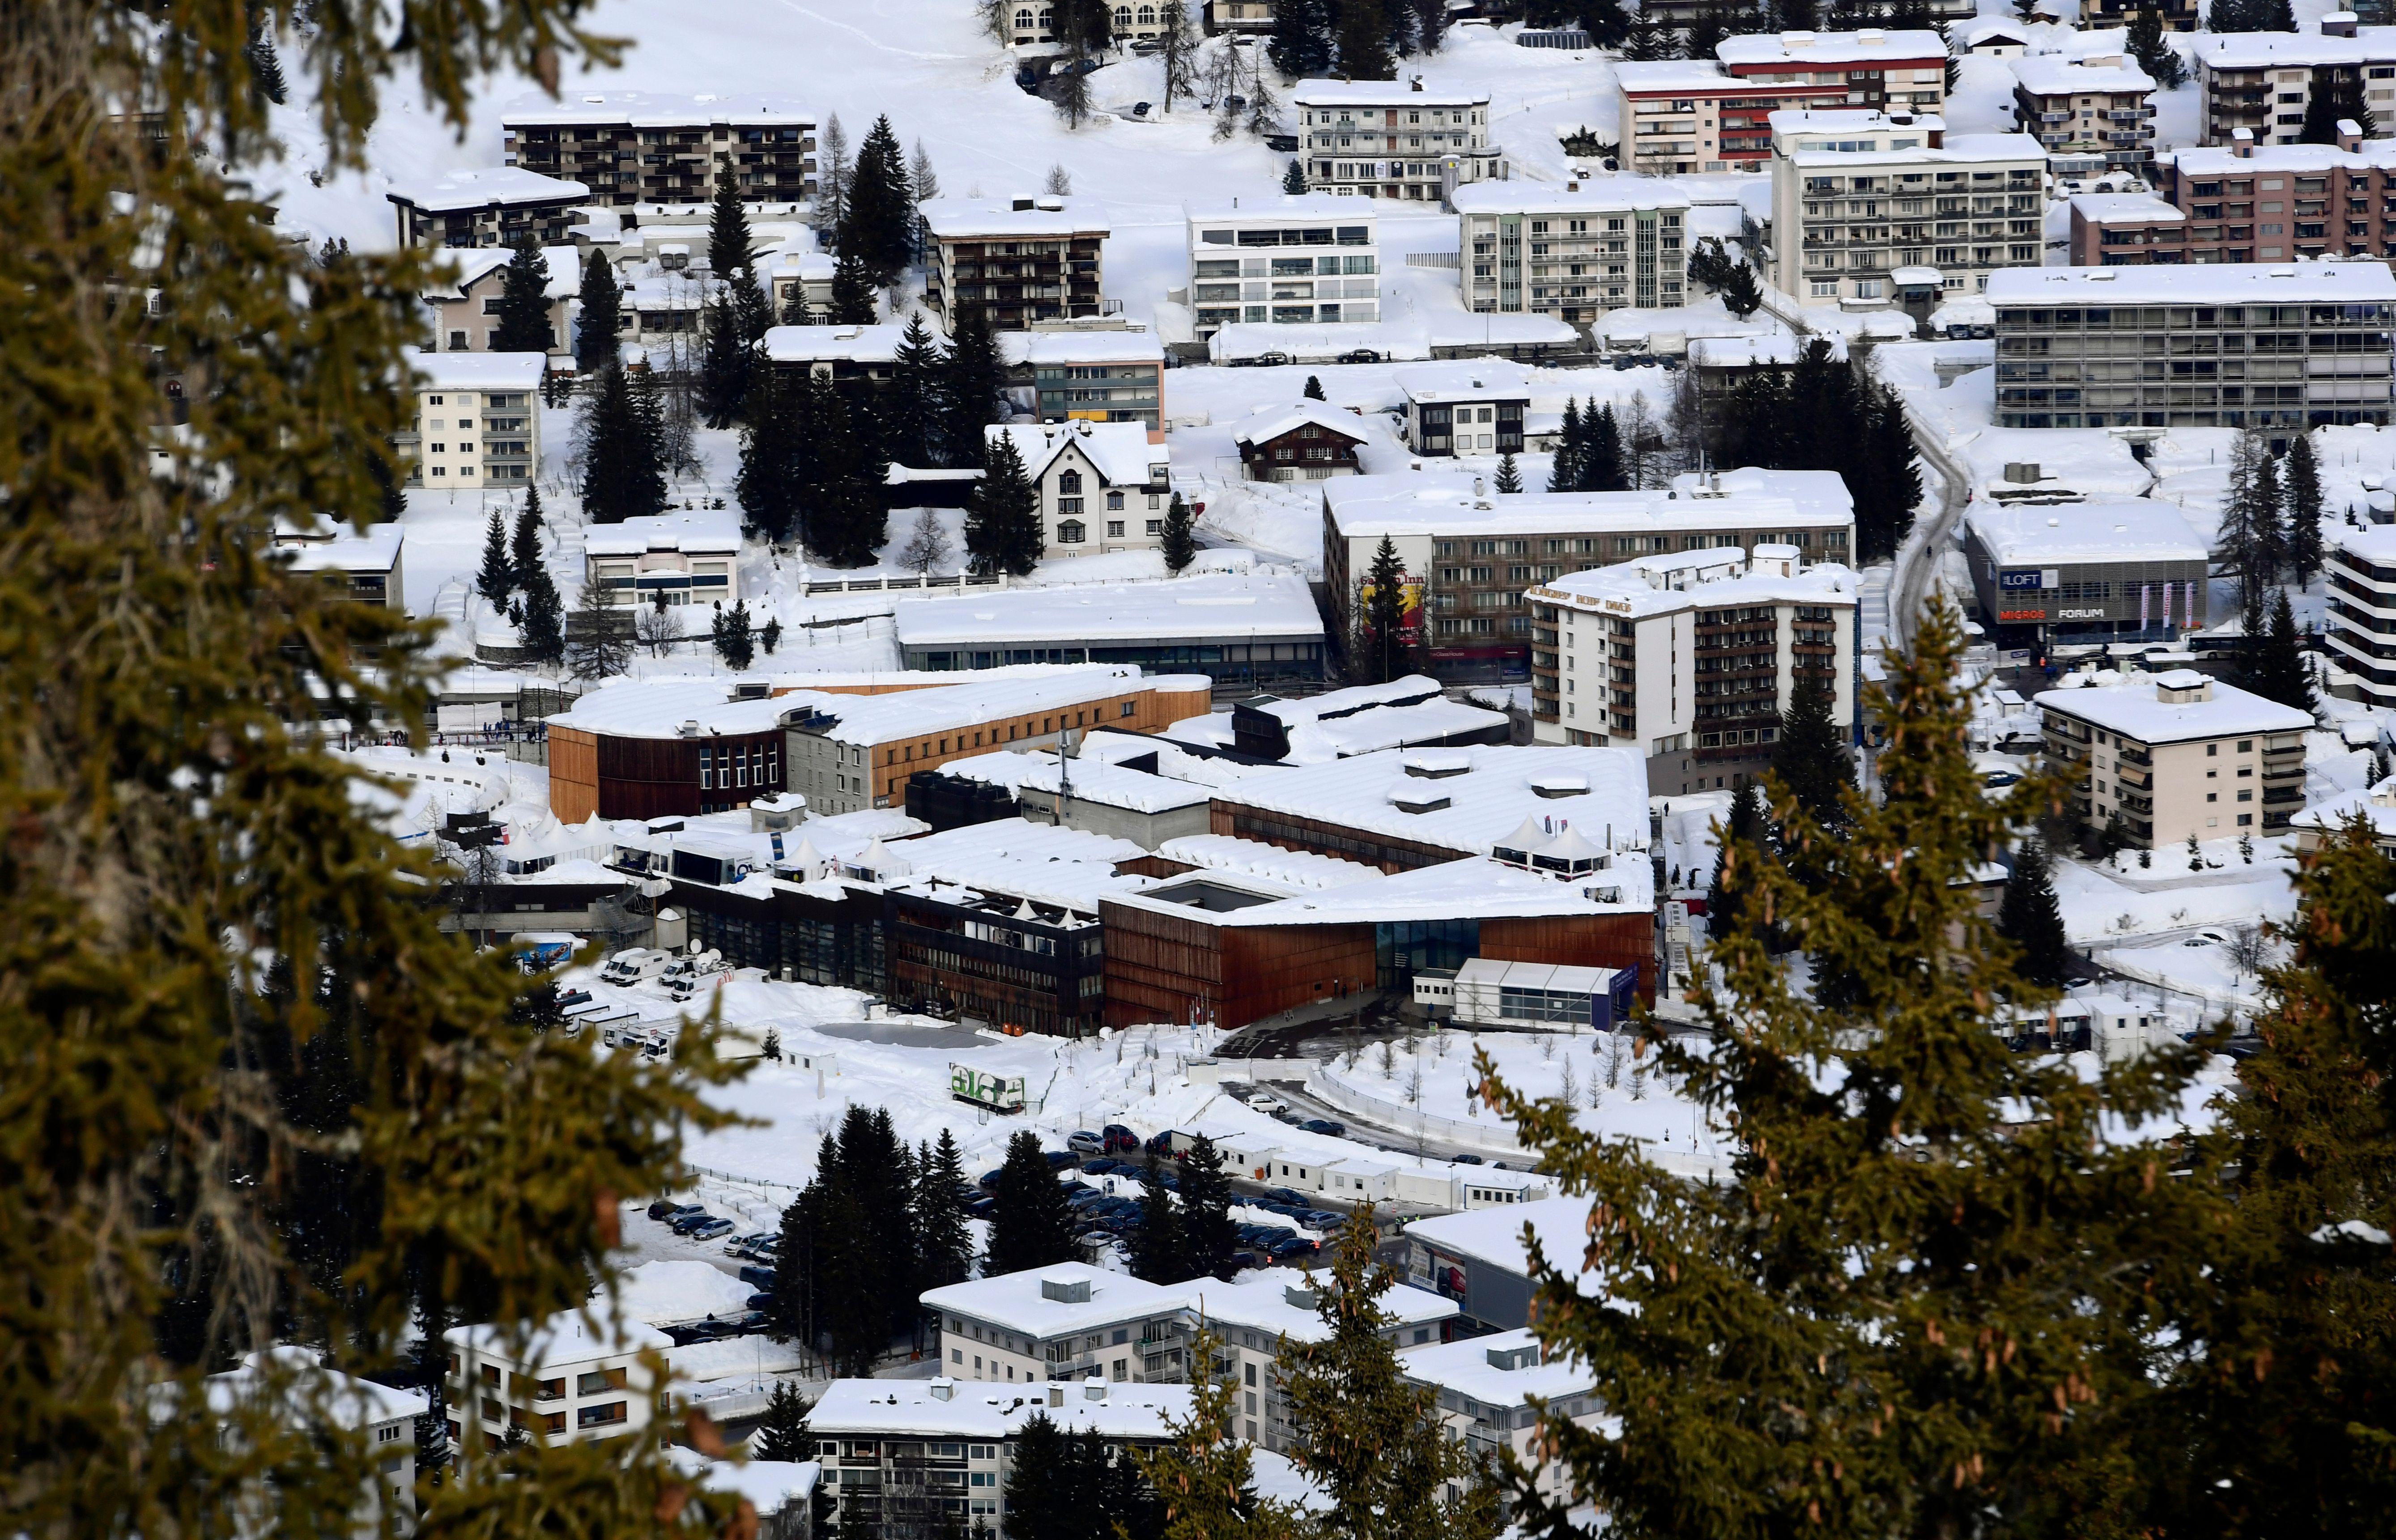 The buildings housing the World Economic Forum in Davos, Switzerland